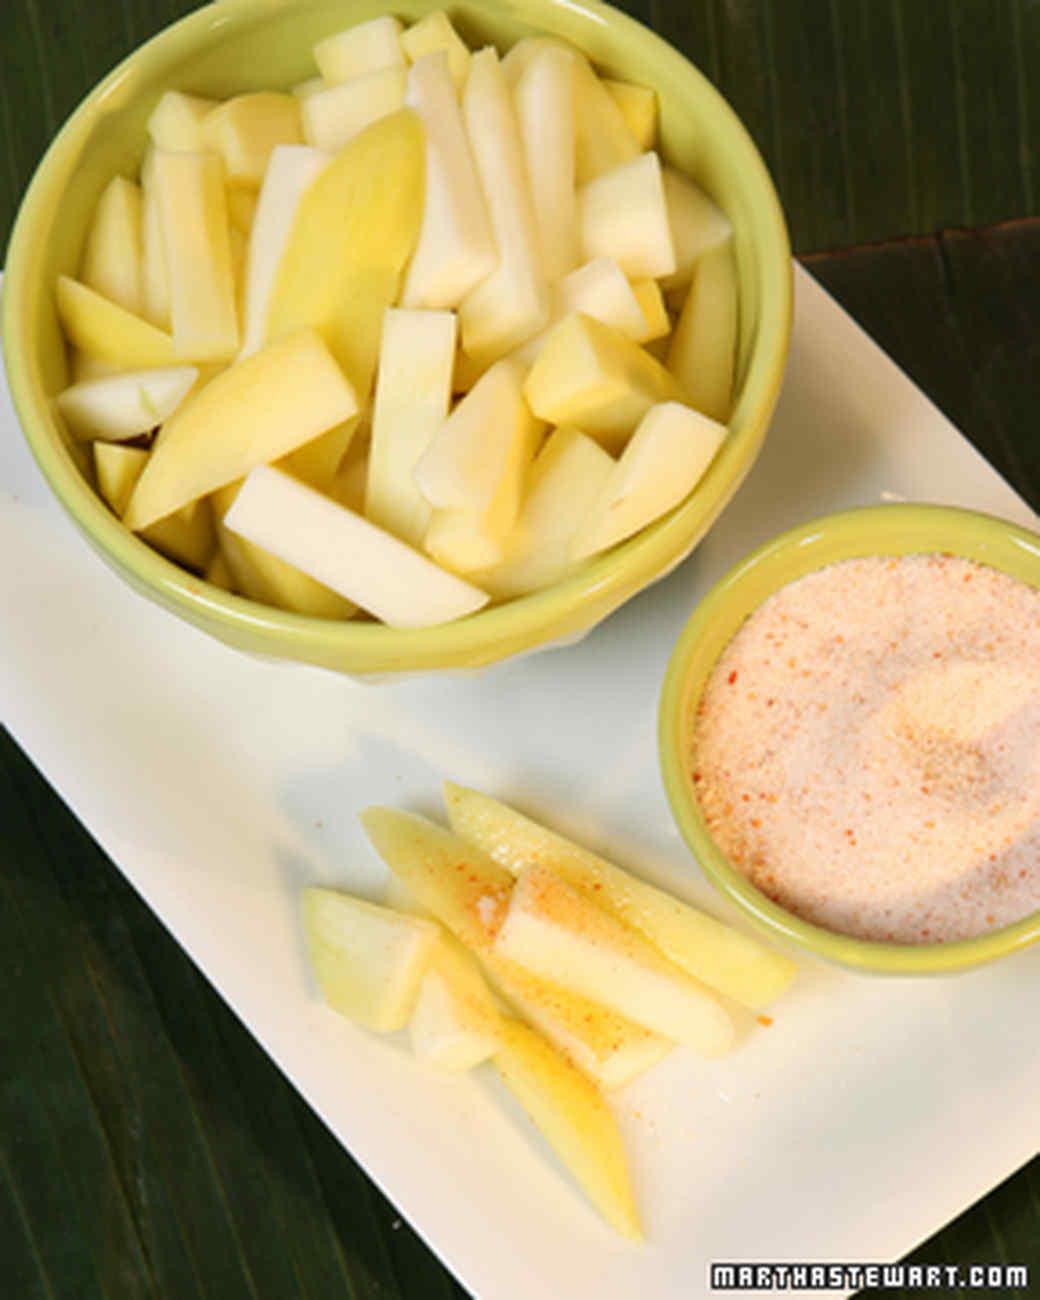 Green Mangos with Chili, Salt, and Sugar